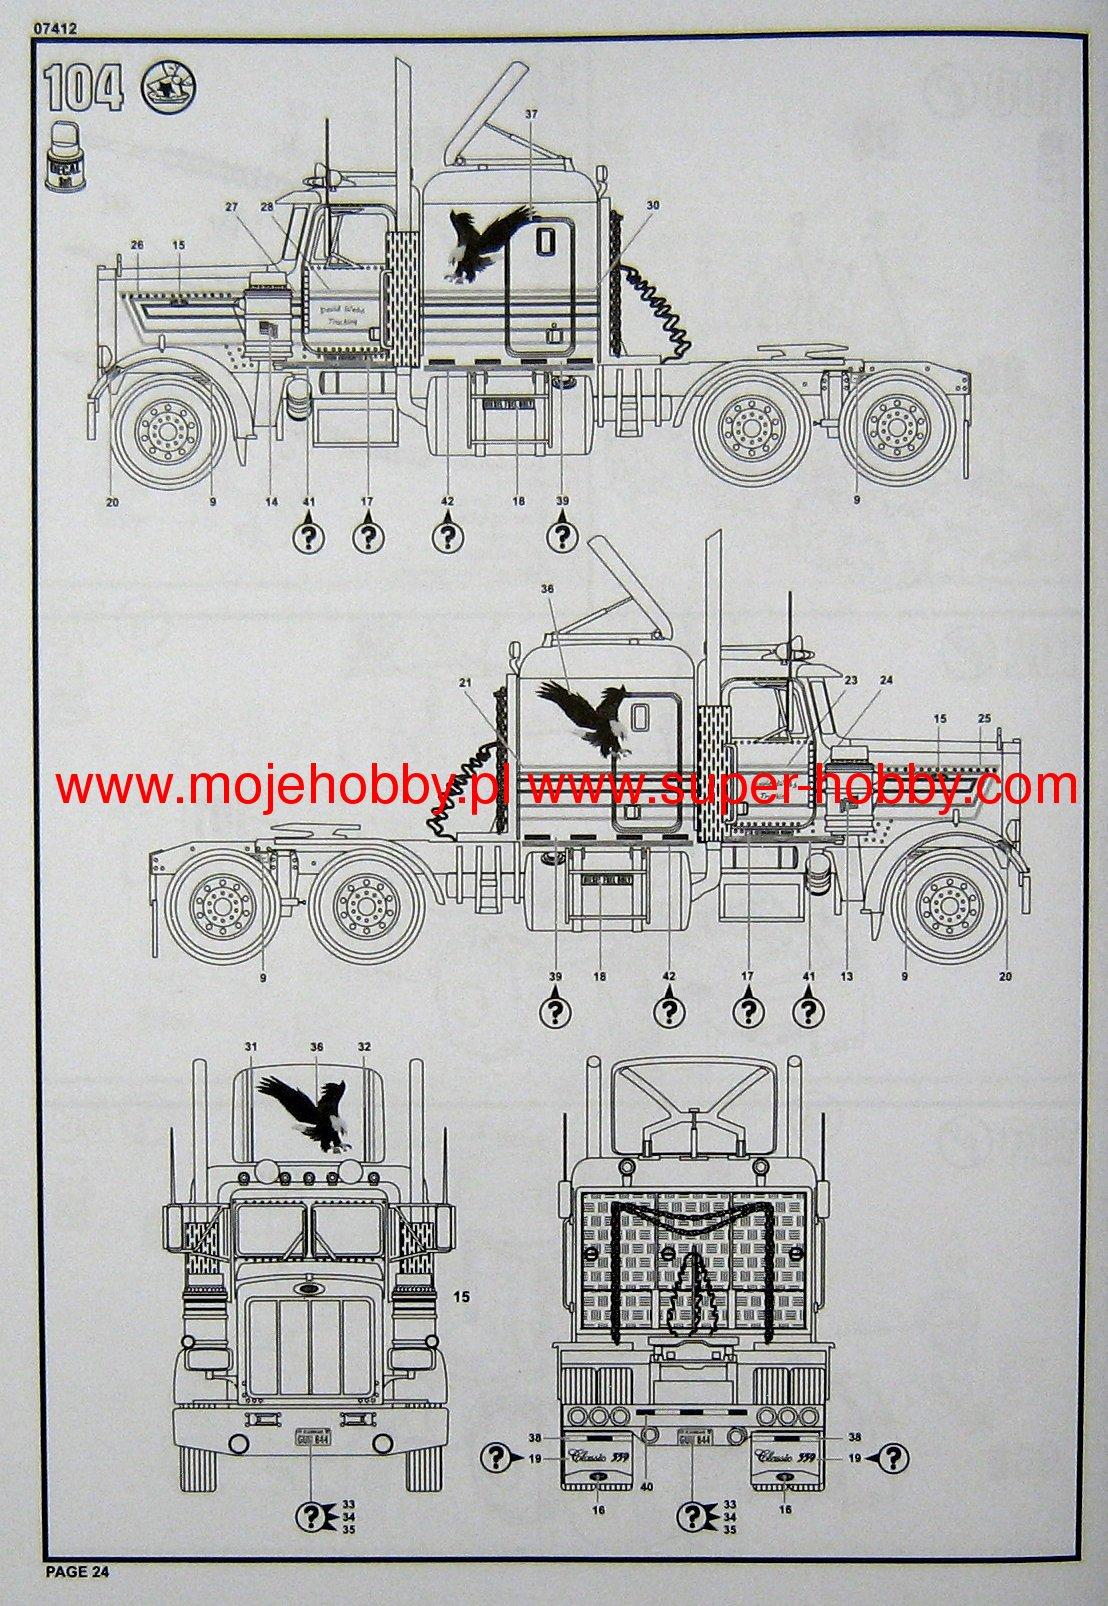 hight resolution of pin 1982 peterbilt 359 wiring diagram on pinterest 2003 387 peterbilt truck wiring schematics at 1984